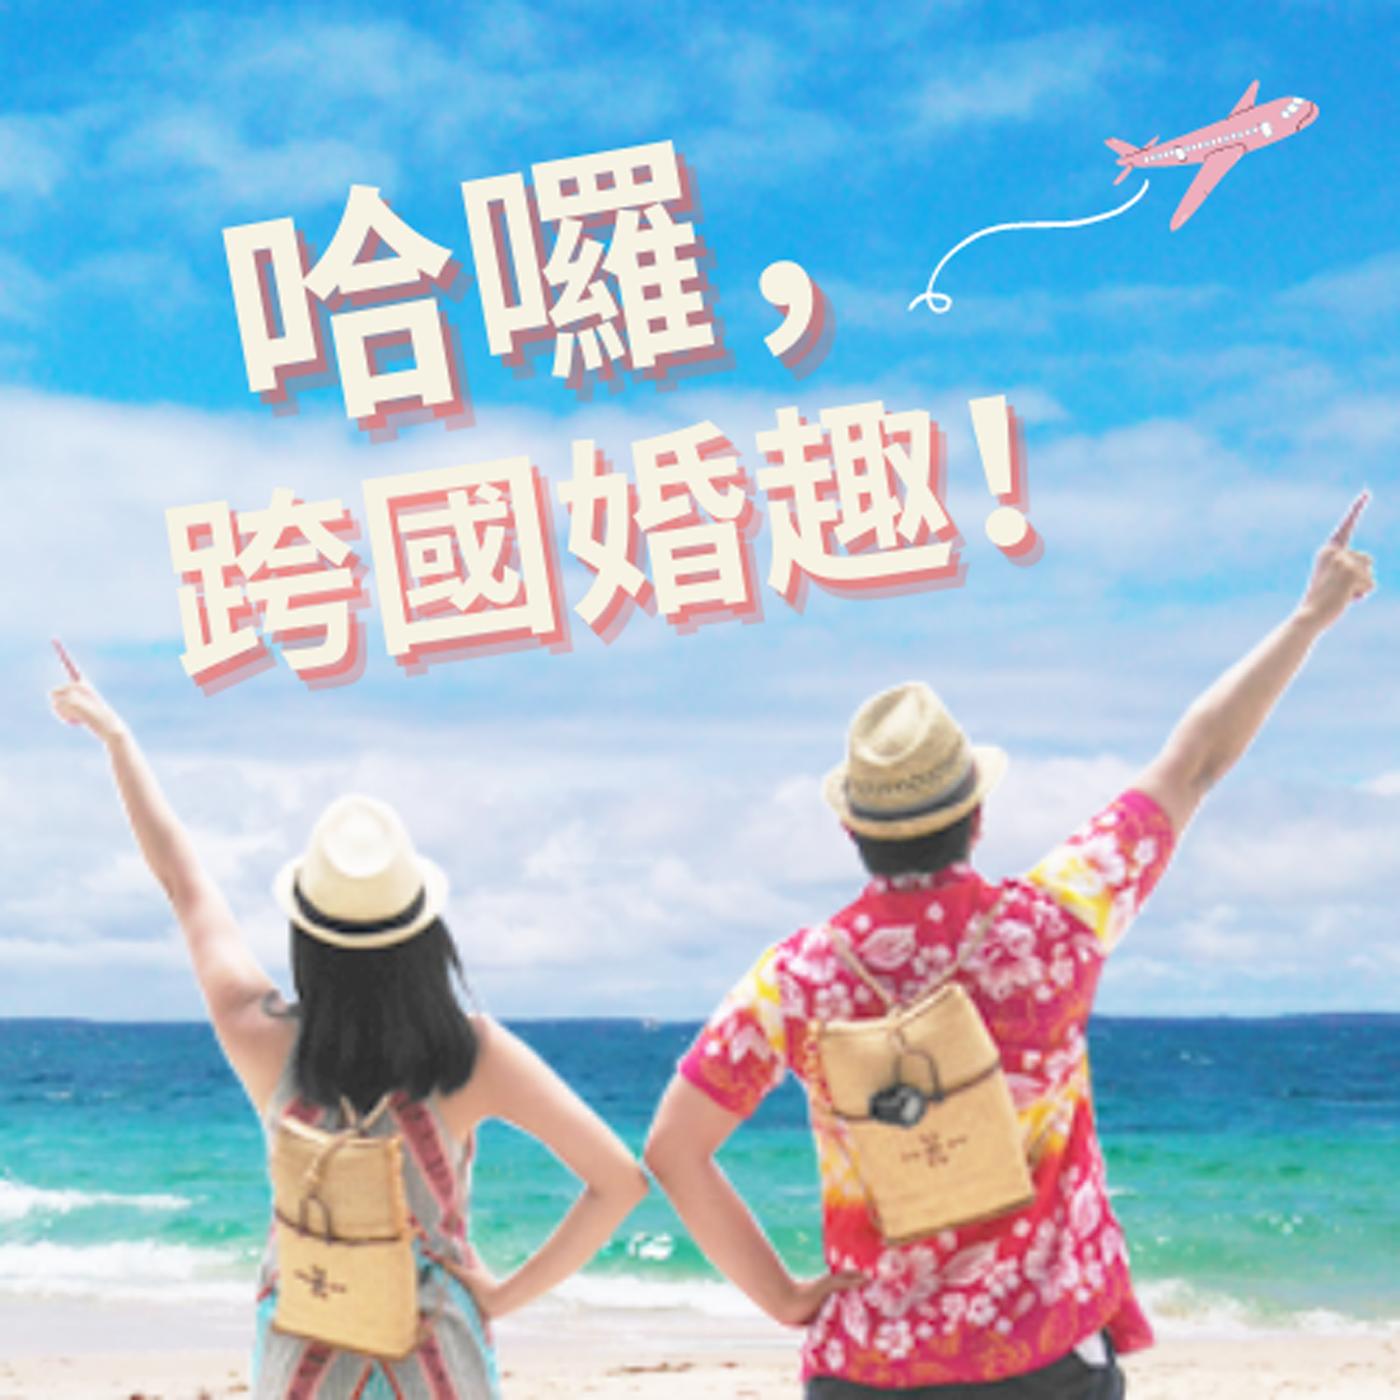 EP3【夫婦訪談】峇里島遇見愛 (下) 劫後餘生的一家人,吵吵鬧鬧就是幸福!|Linda (台灣) ★ Kevin (印尼)